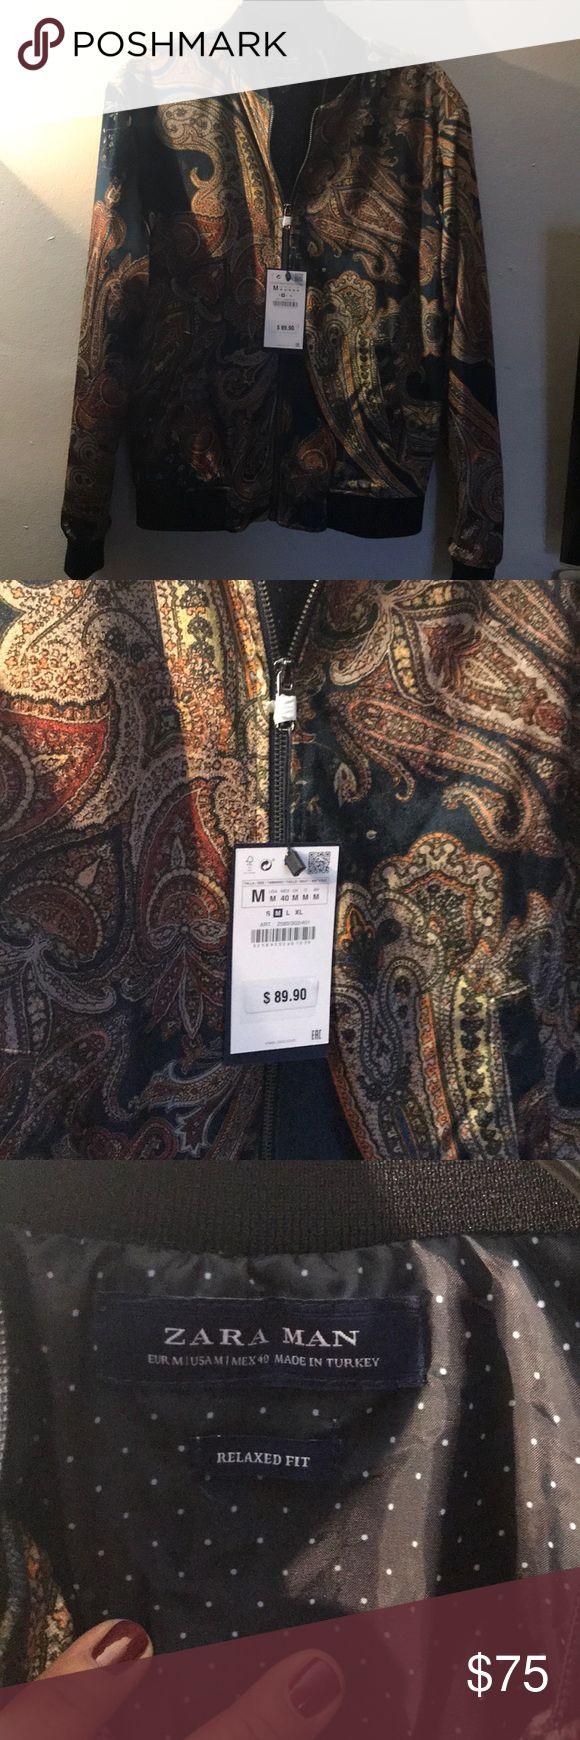 Zara man Jacket Velvet Jacquard Jacket for men size Medium. NWT the color is A dark navy blue with gold. Zara Jackets & Coats Bomber & Varsity